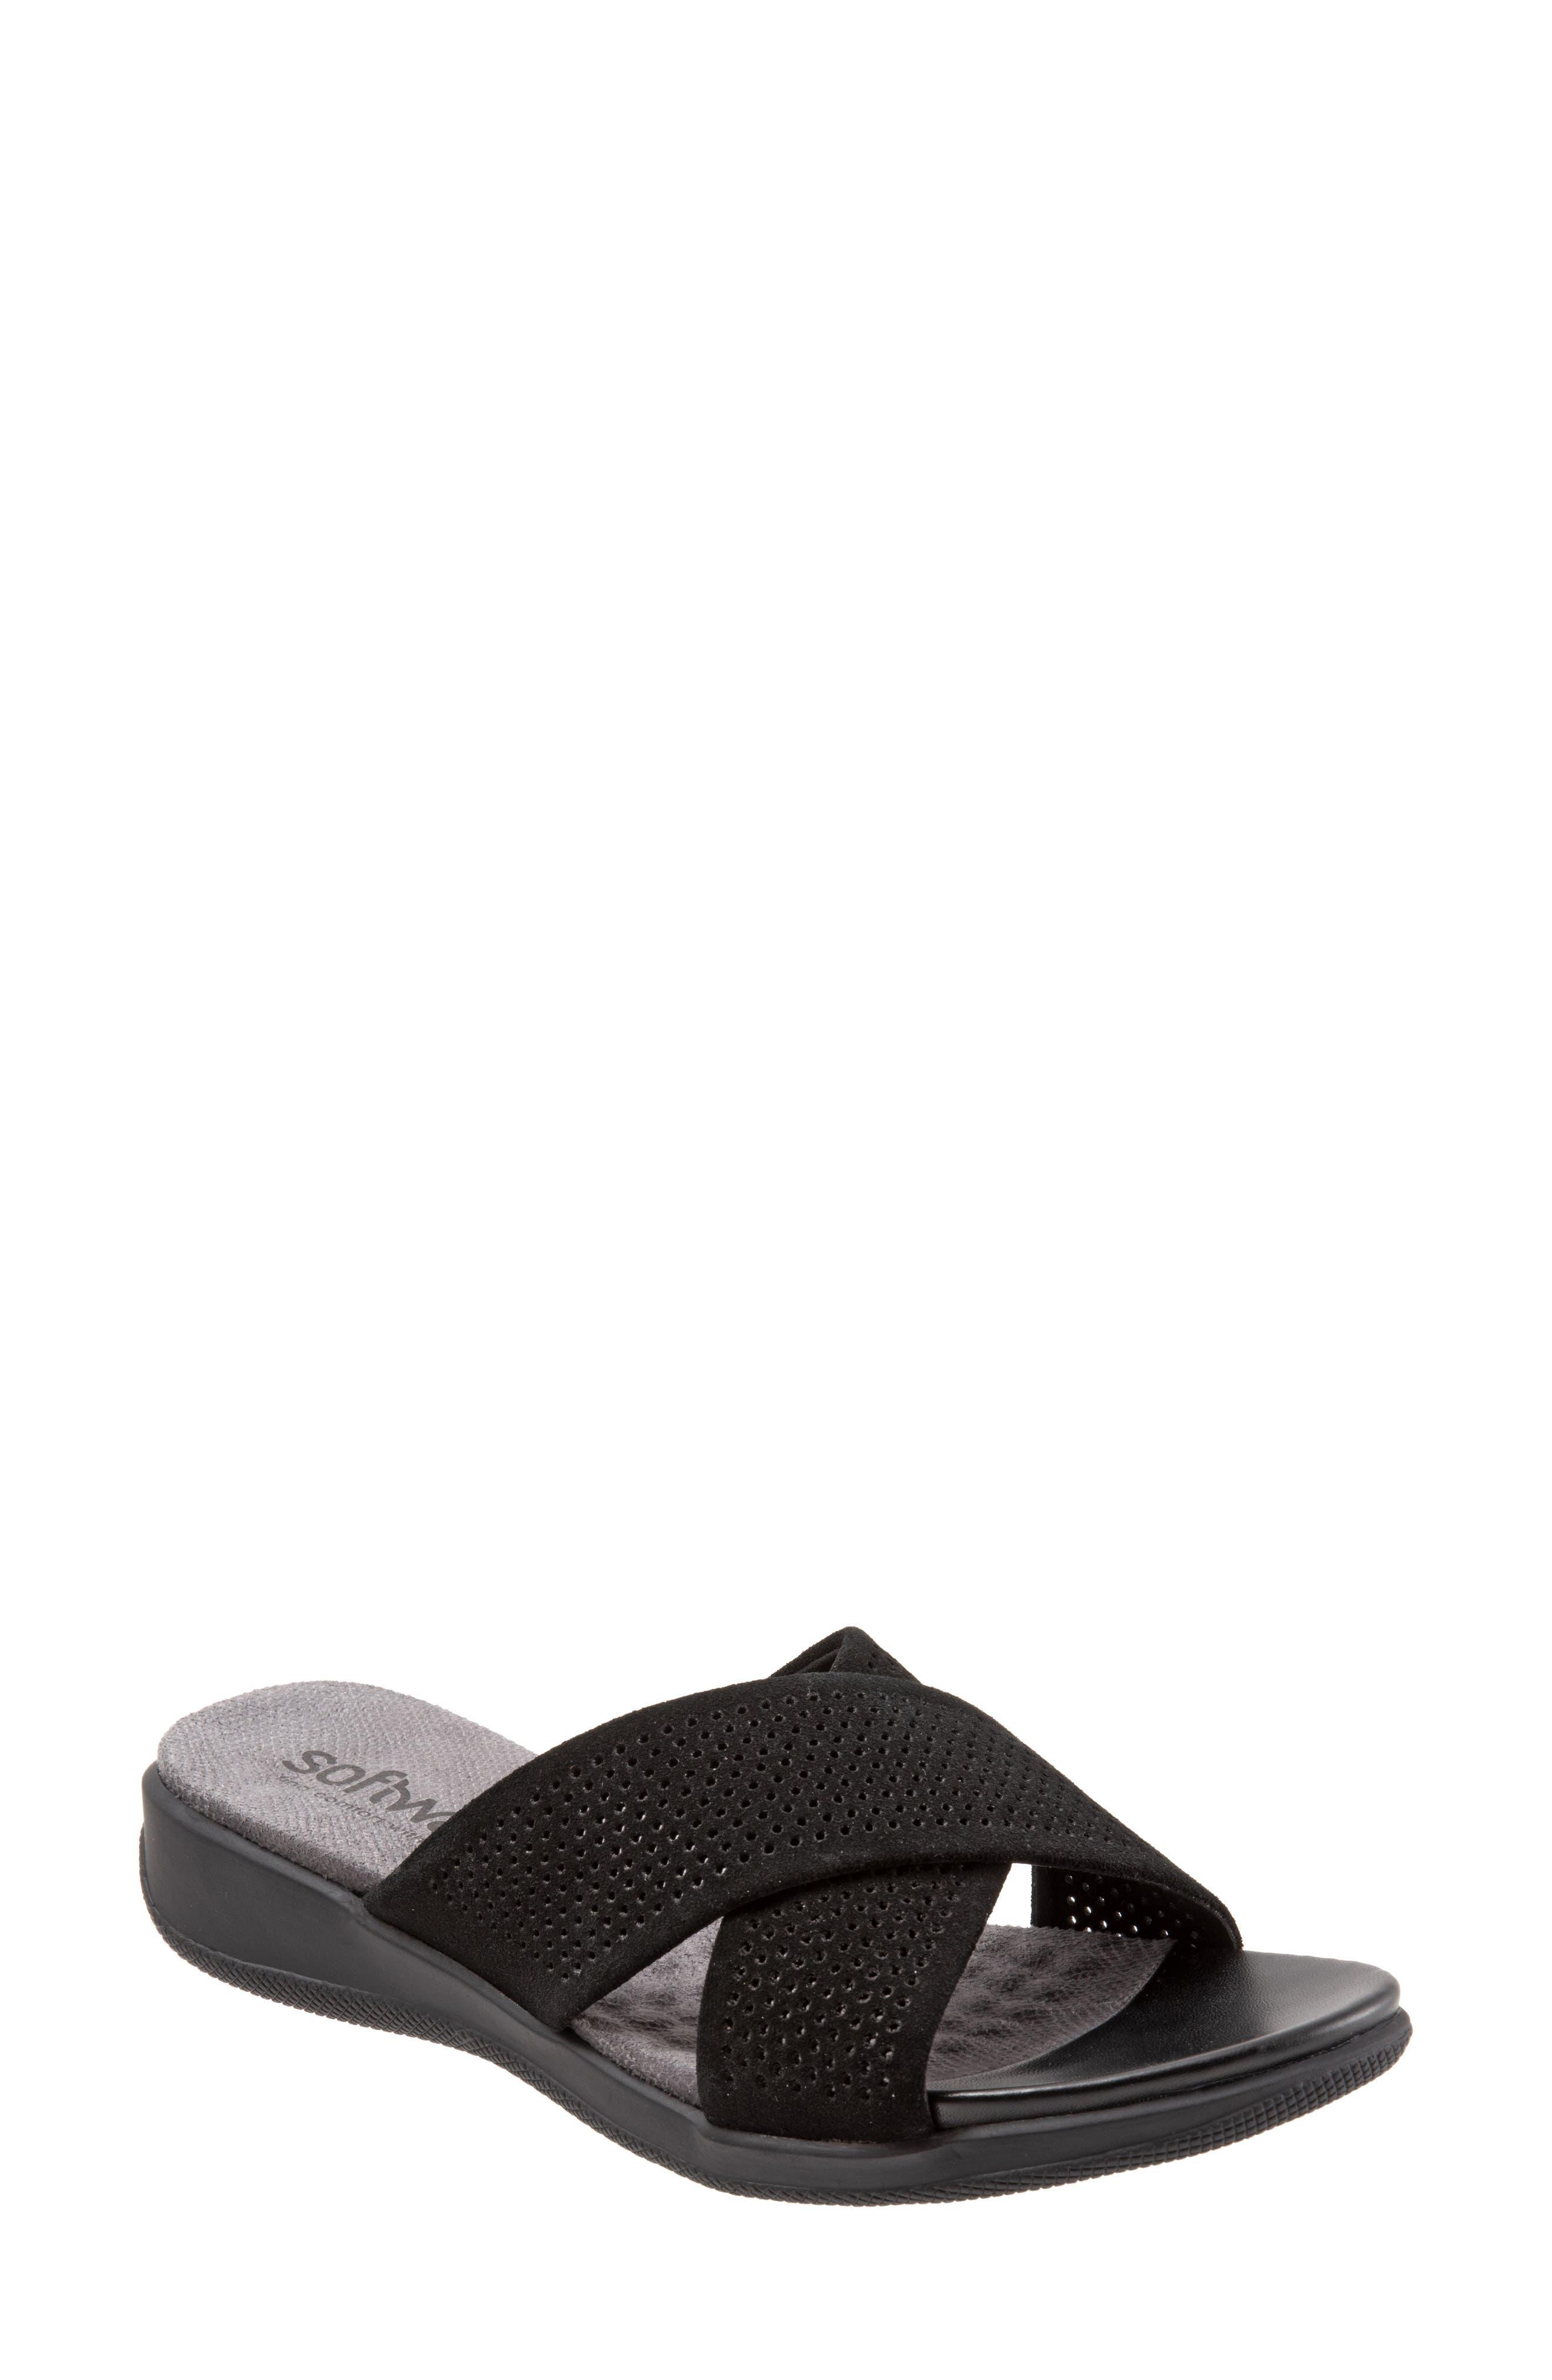 SOFTWALK<SUP>®</SUP>, 'Tillman' Leather Cross Strap Slide Sandal, Main thumbnail 1, color, 002